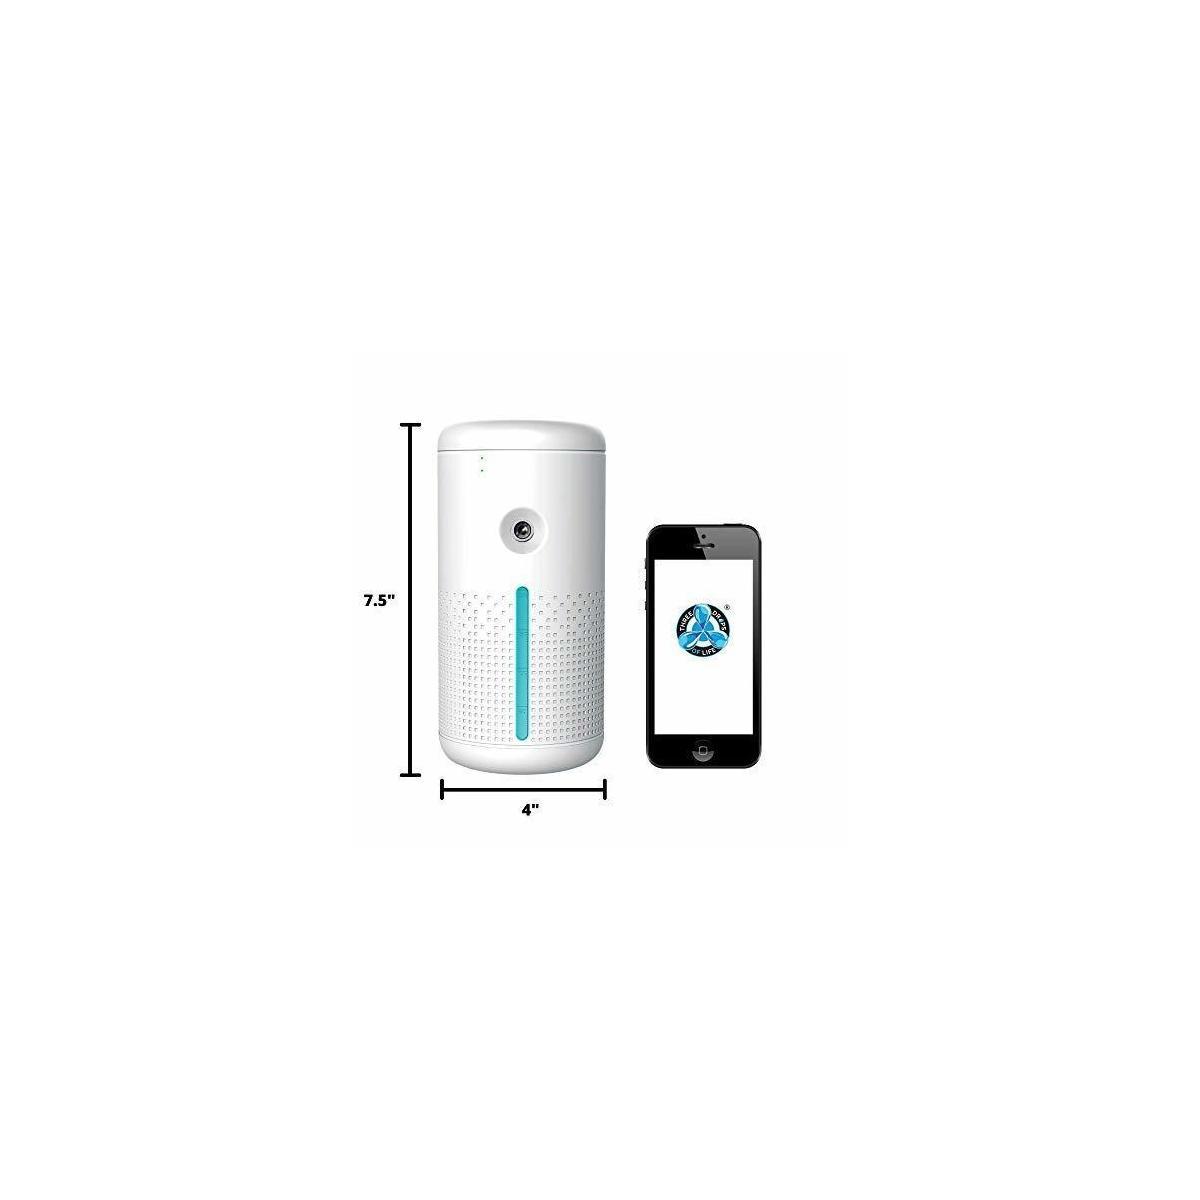 Ultrasonic Scent Machine - No Water Technology